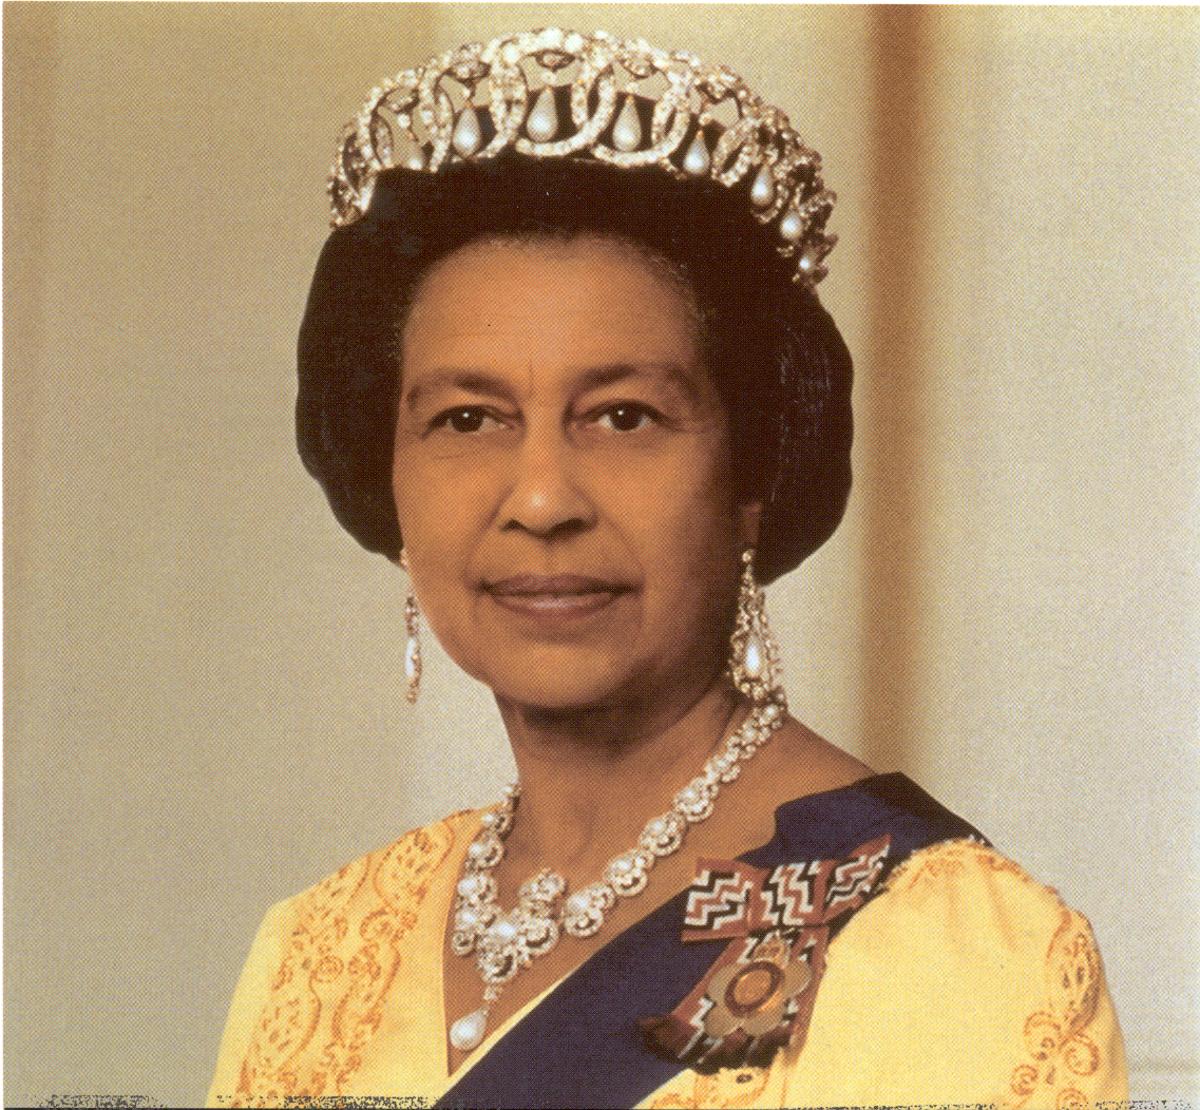 Queen Elizabeth II as she actually is